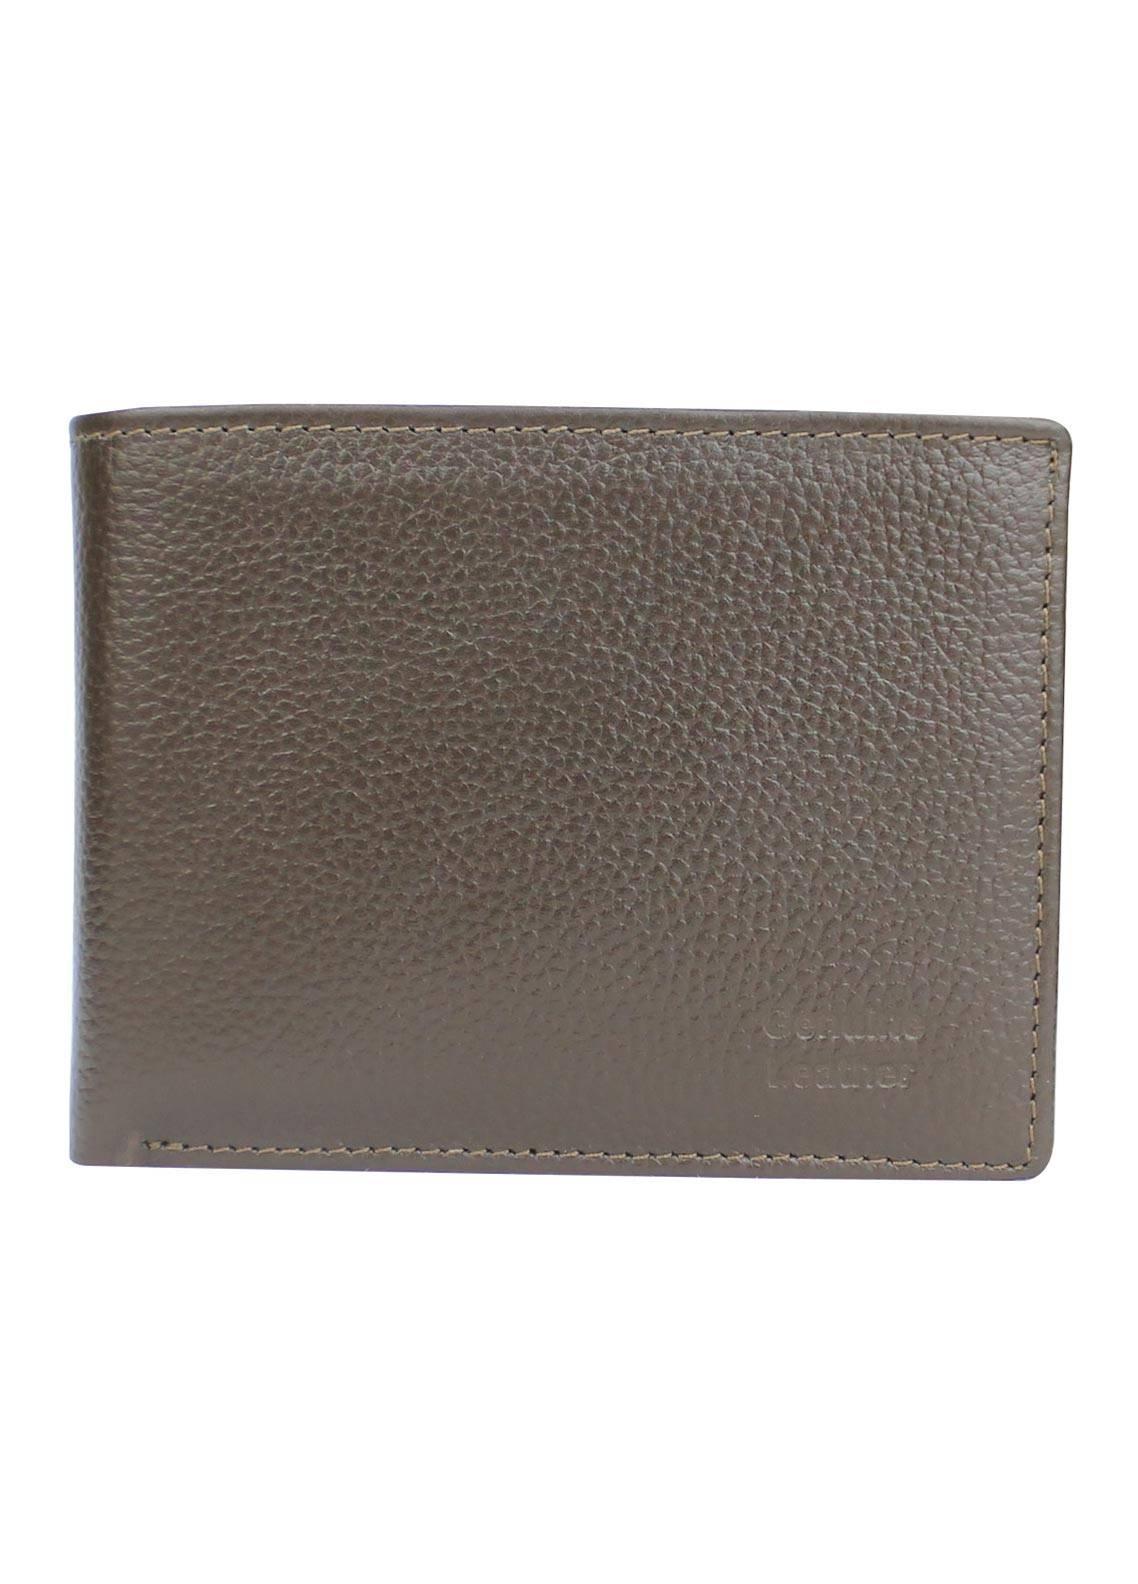 Shahzeb Saeed Plain Texture Leather  Wallet W-070 - Men's Accessories